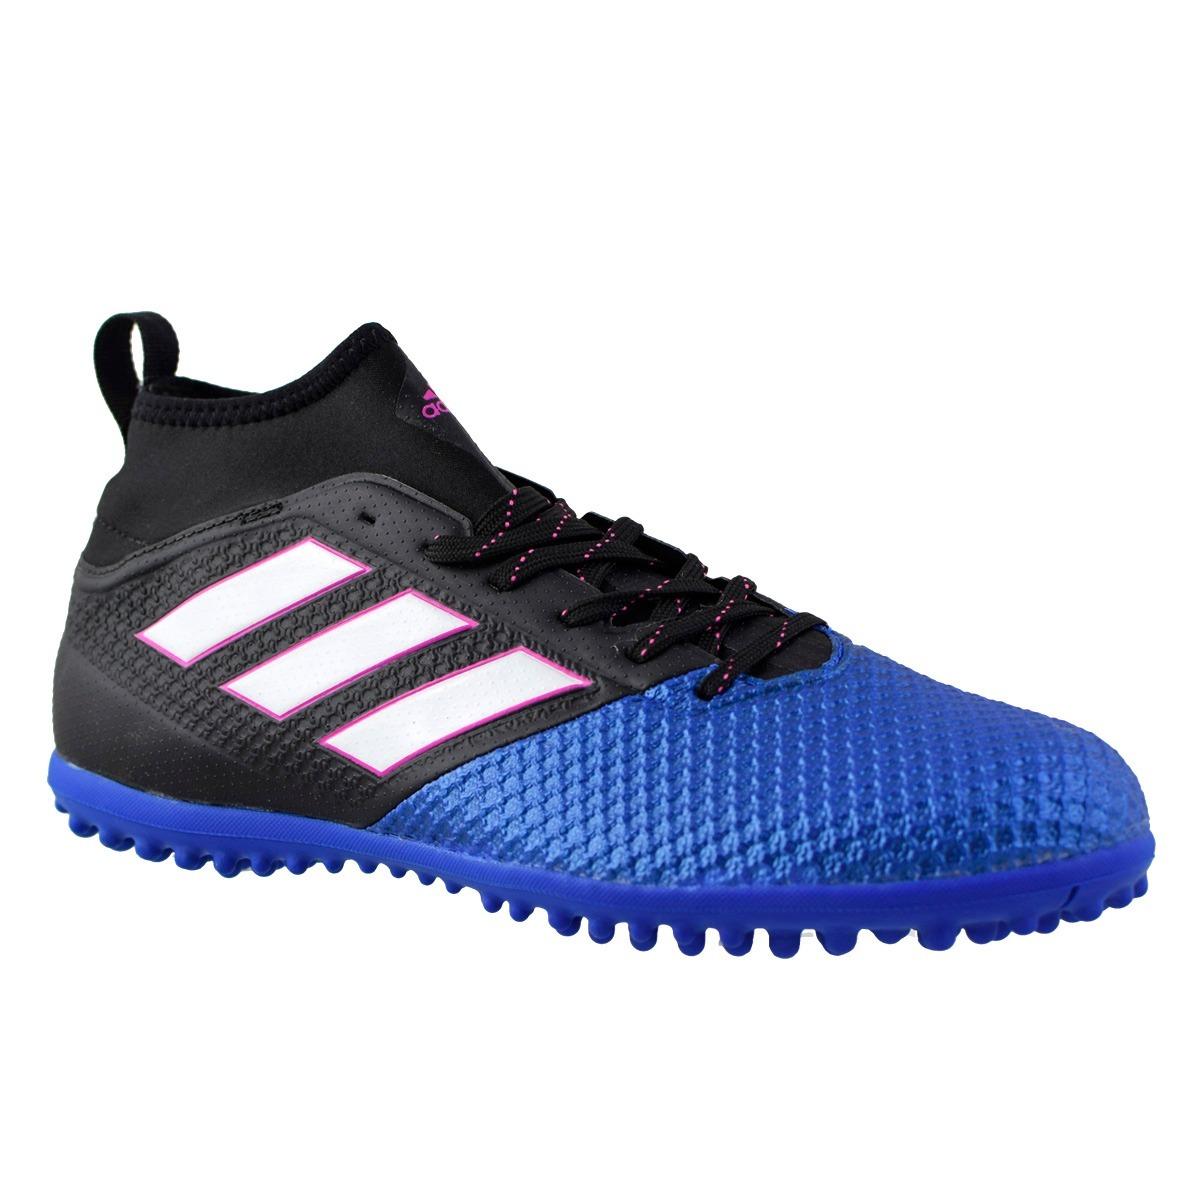 Botines adidas Ace 17.3 Primemesh Tf Hombre Azul